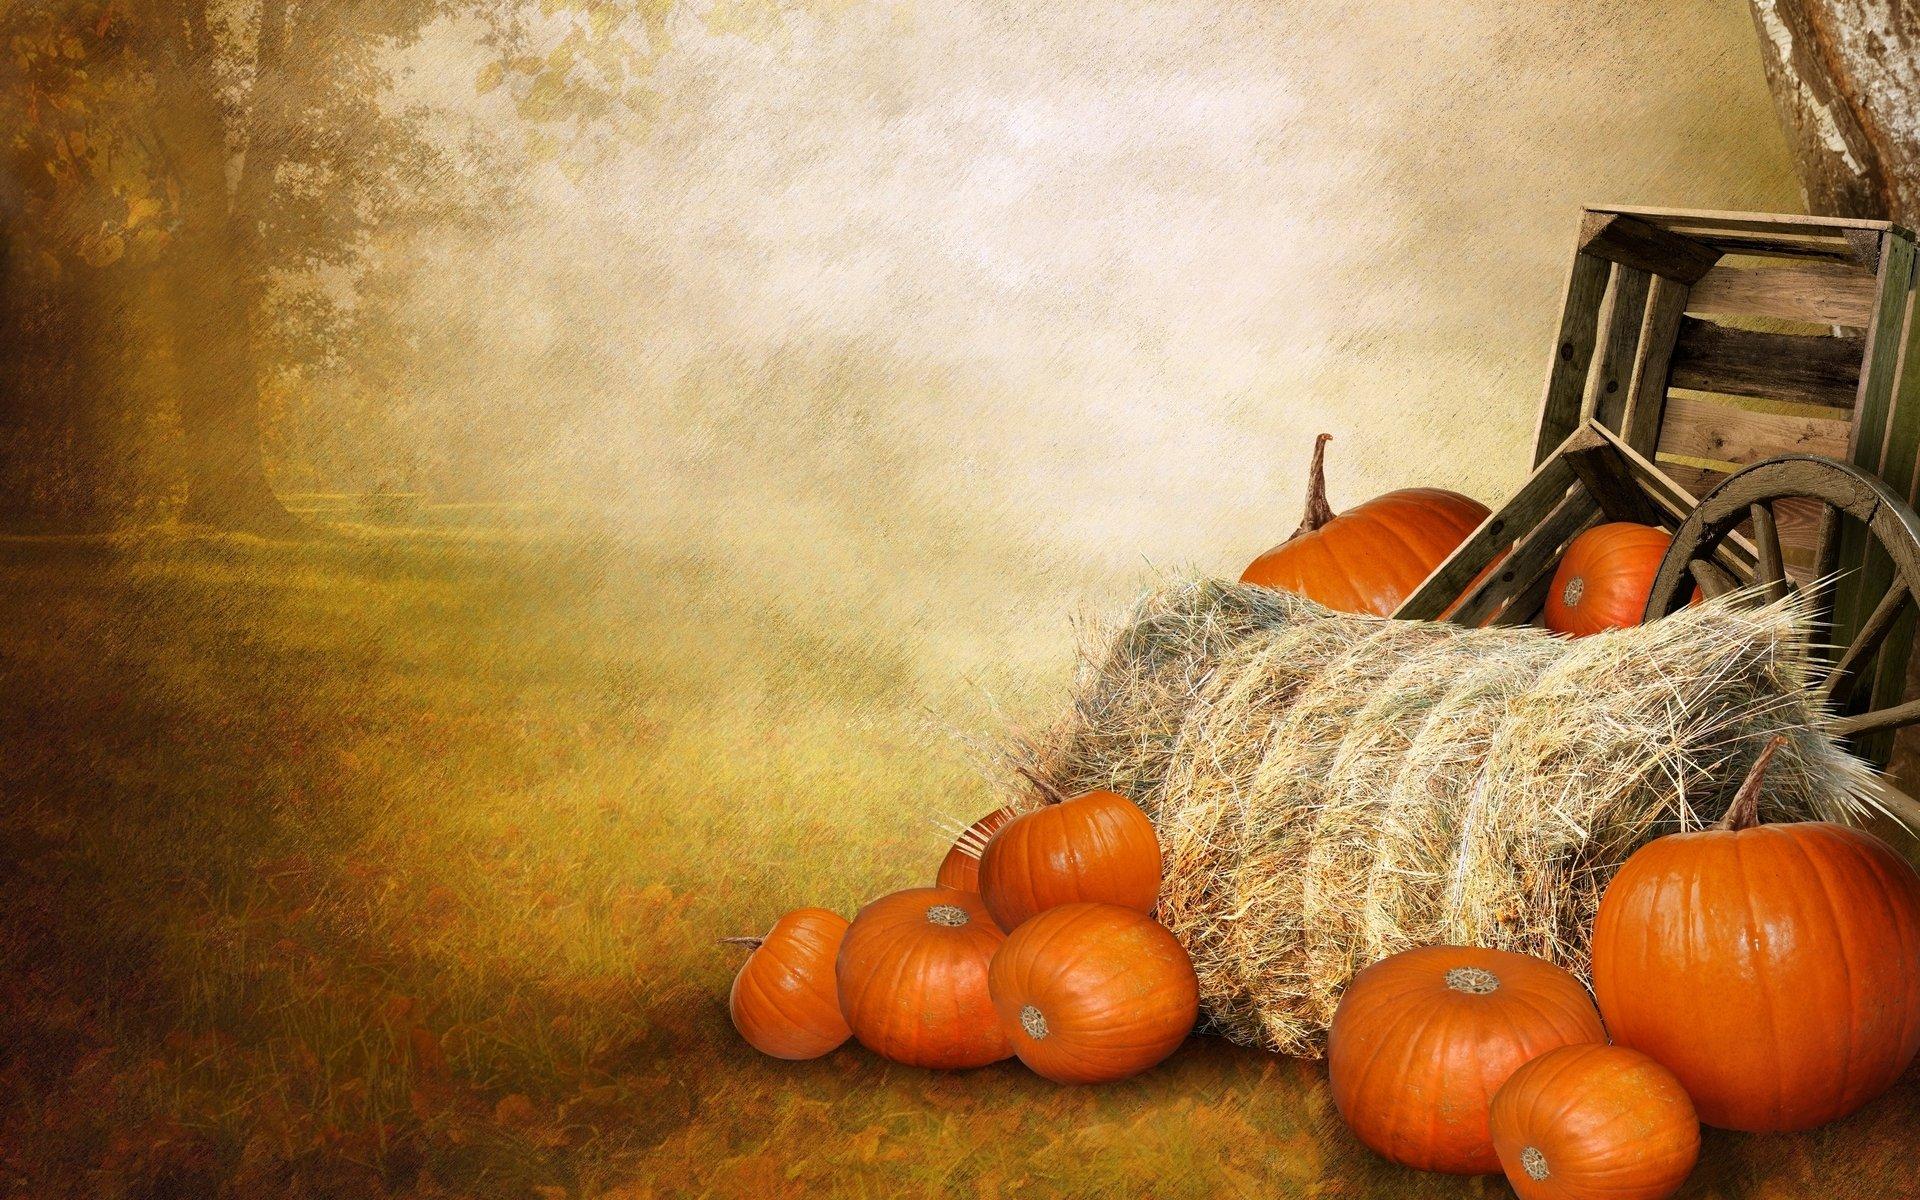 Fall Pumpkin Iphone Wallpaper Fall Full Hd Wallpaper And Background Image 1920x1200